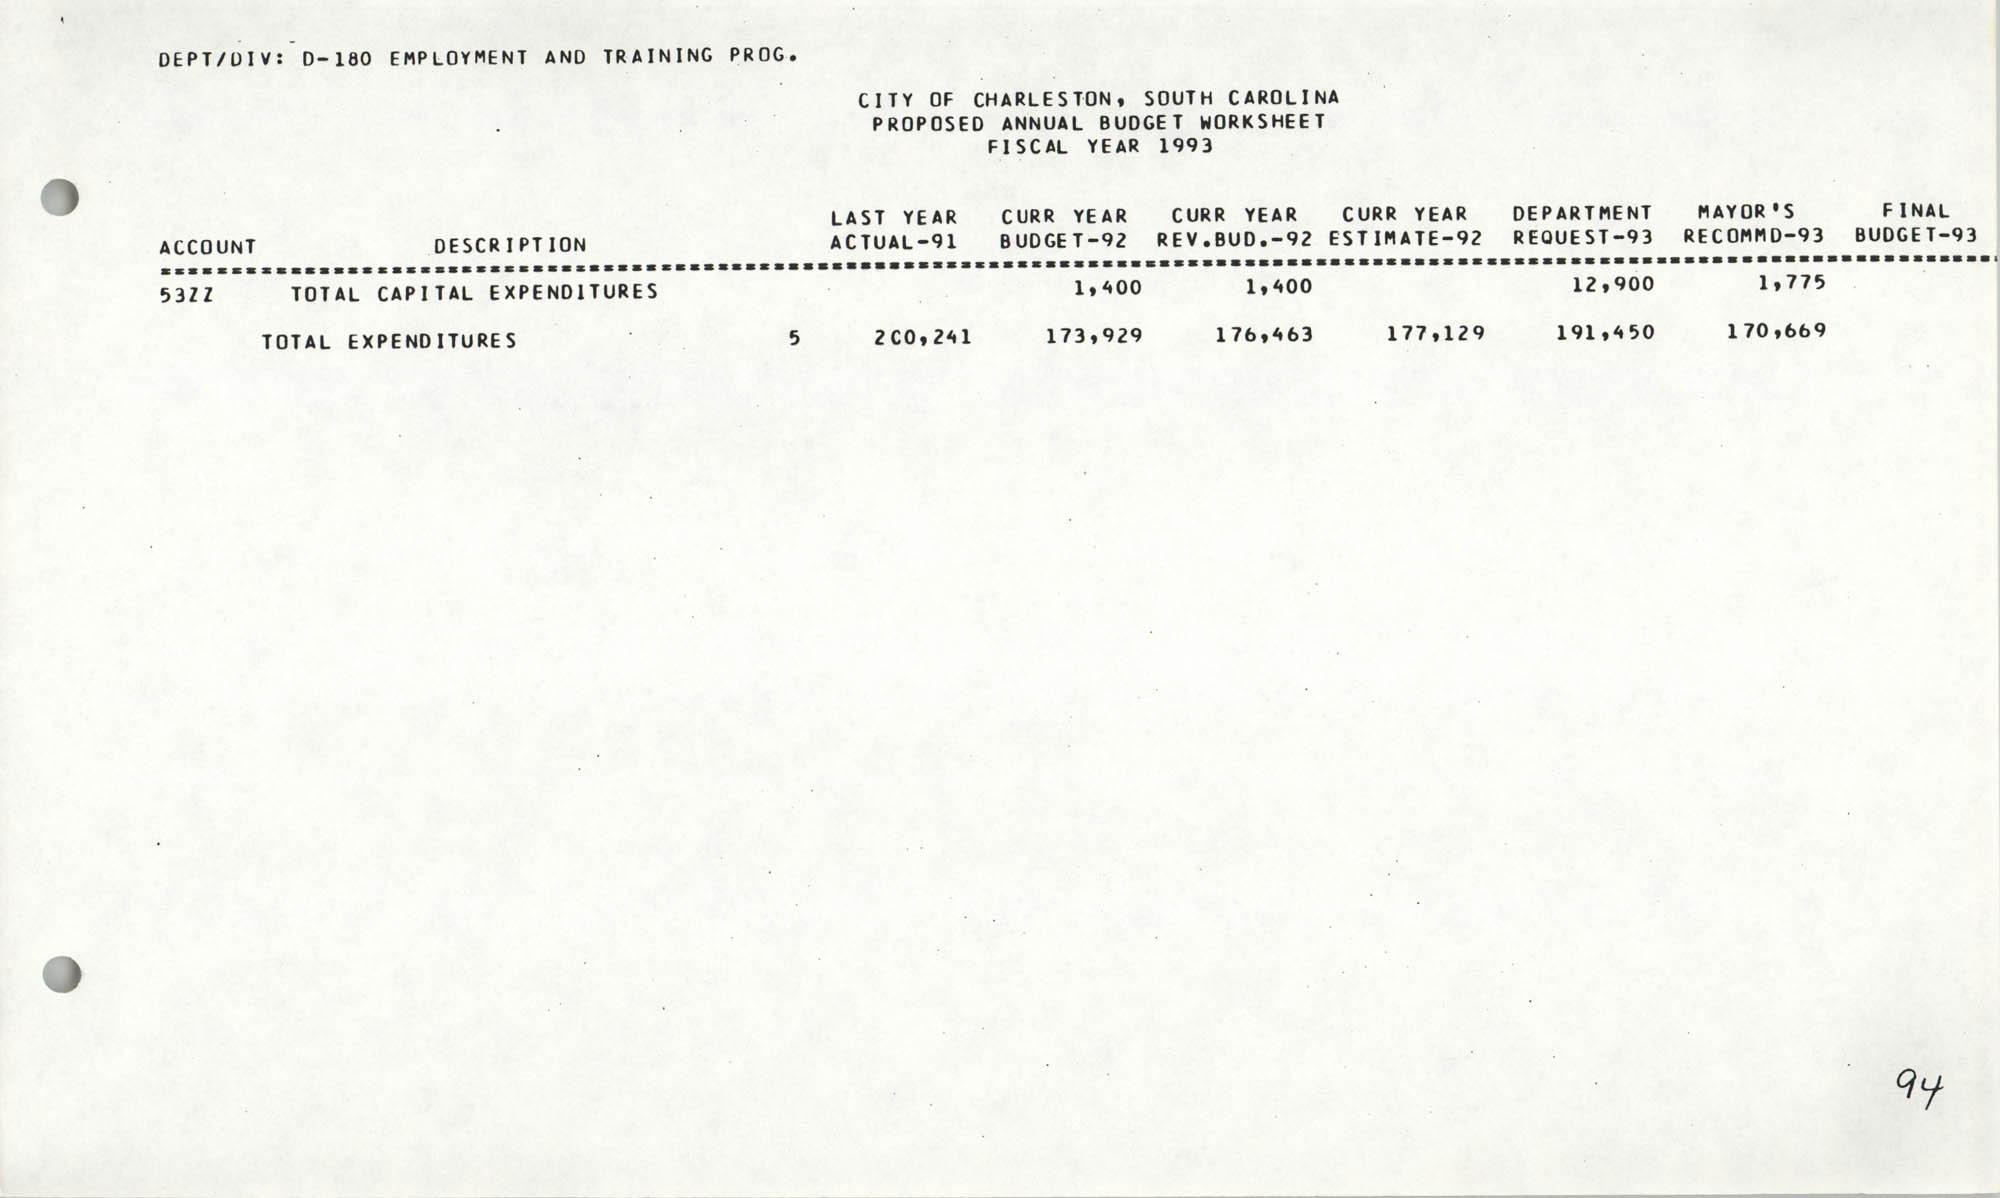 The City Council of Charleston, South Carolina, 1993 Budget, Page 94